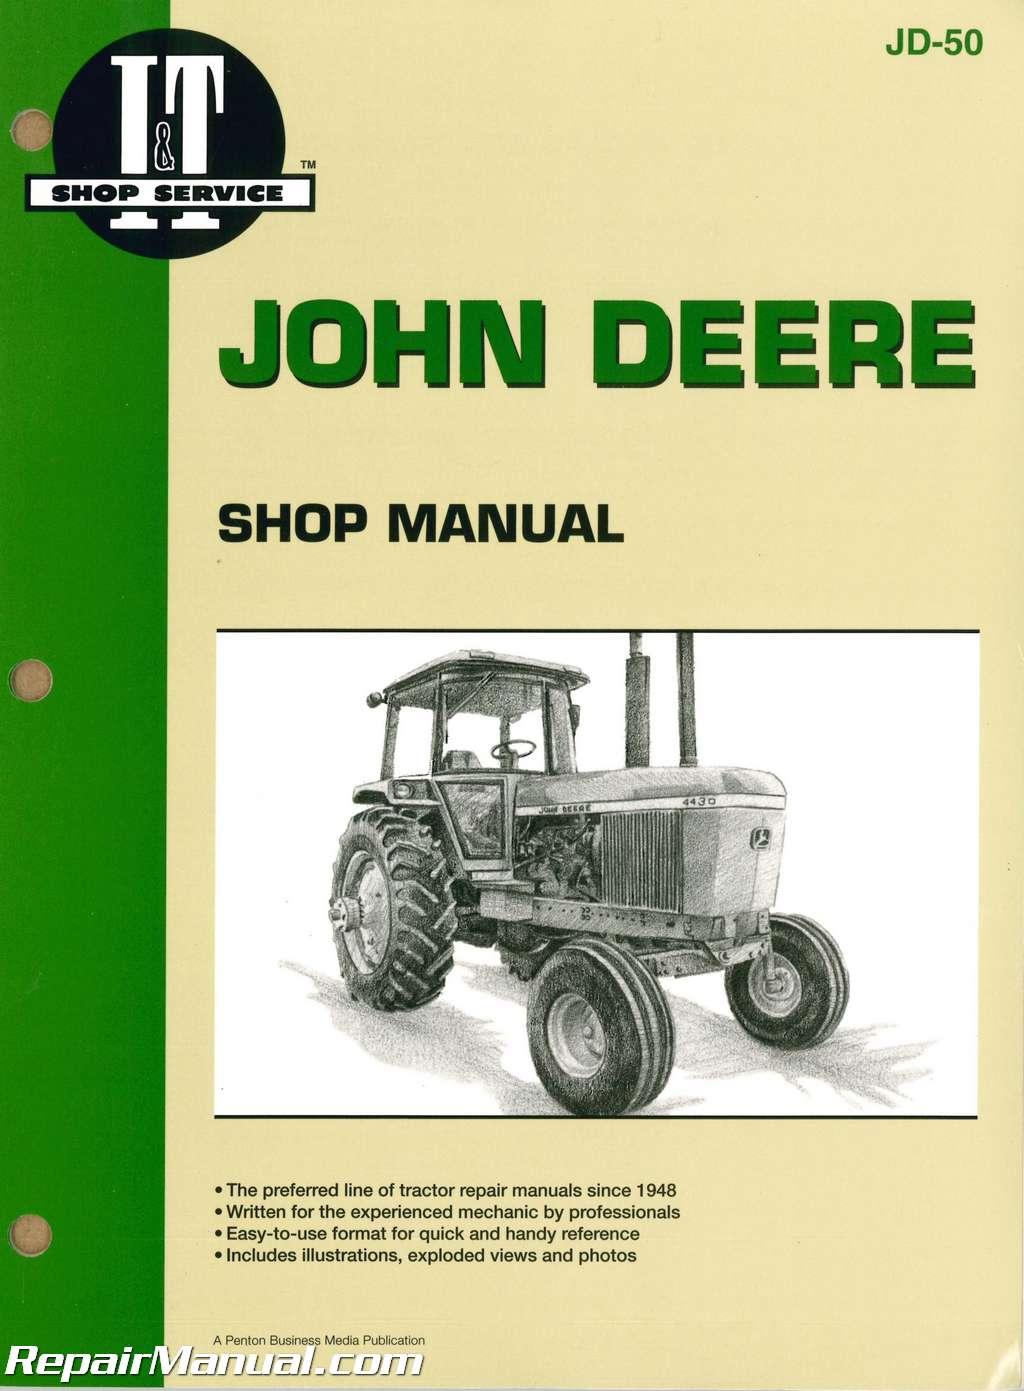 John Deere 4030 4230 4430 4630 Tractor Workshop Manual   Jd